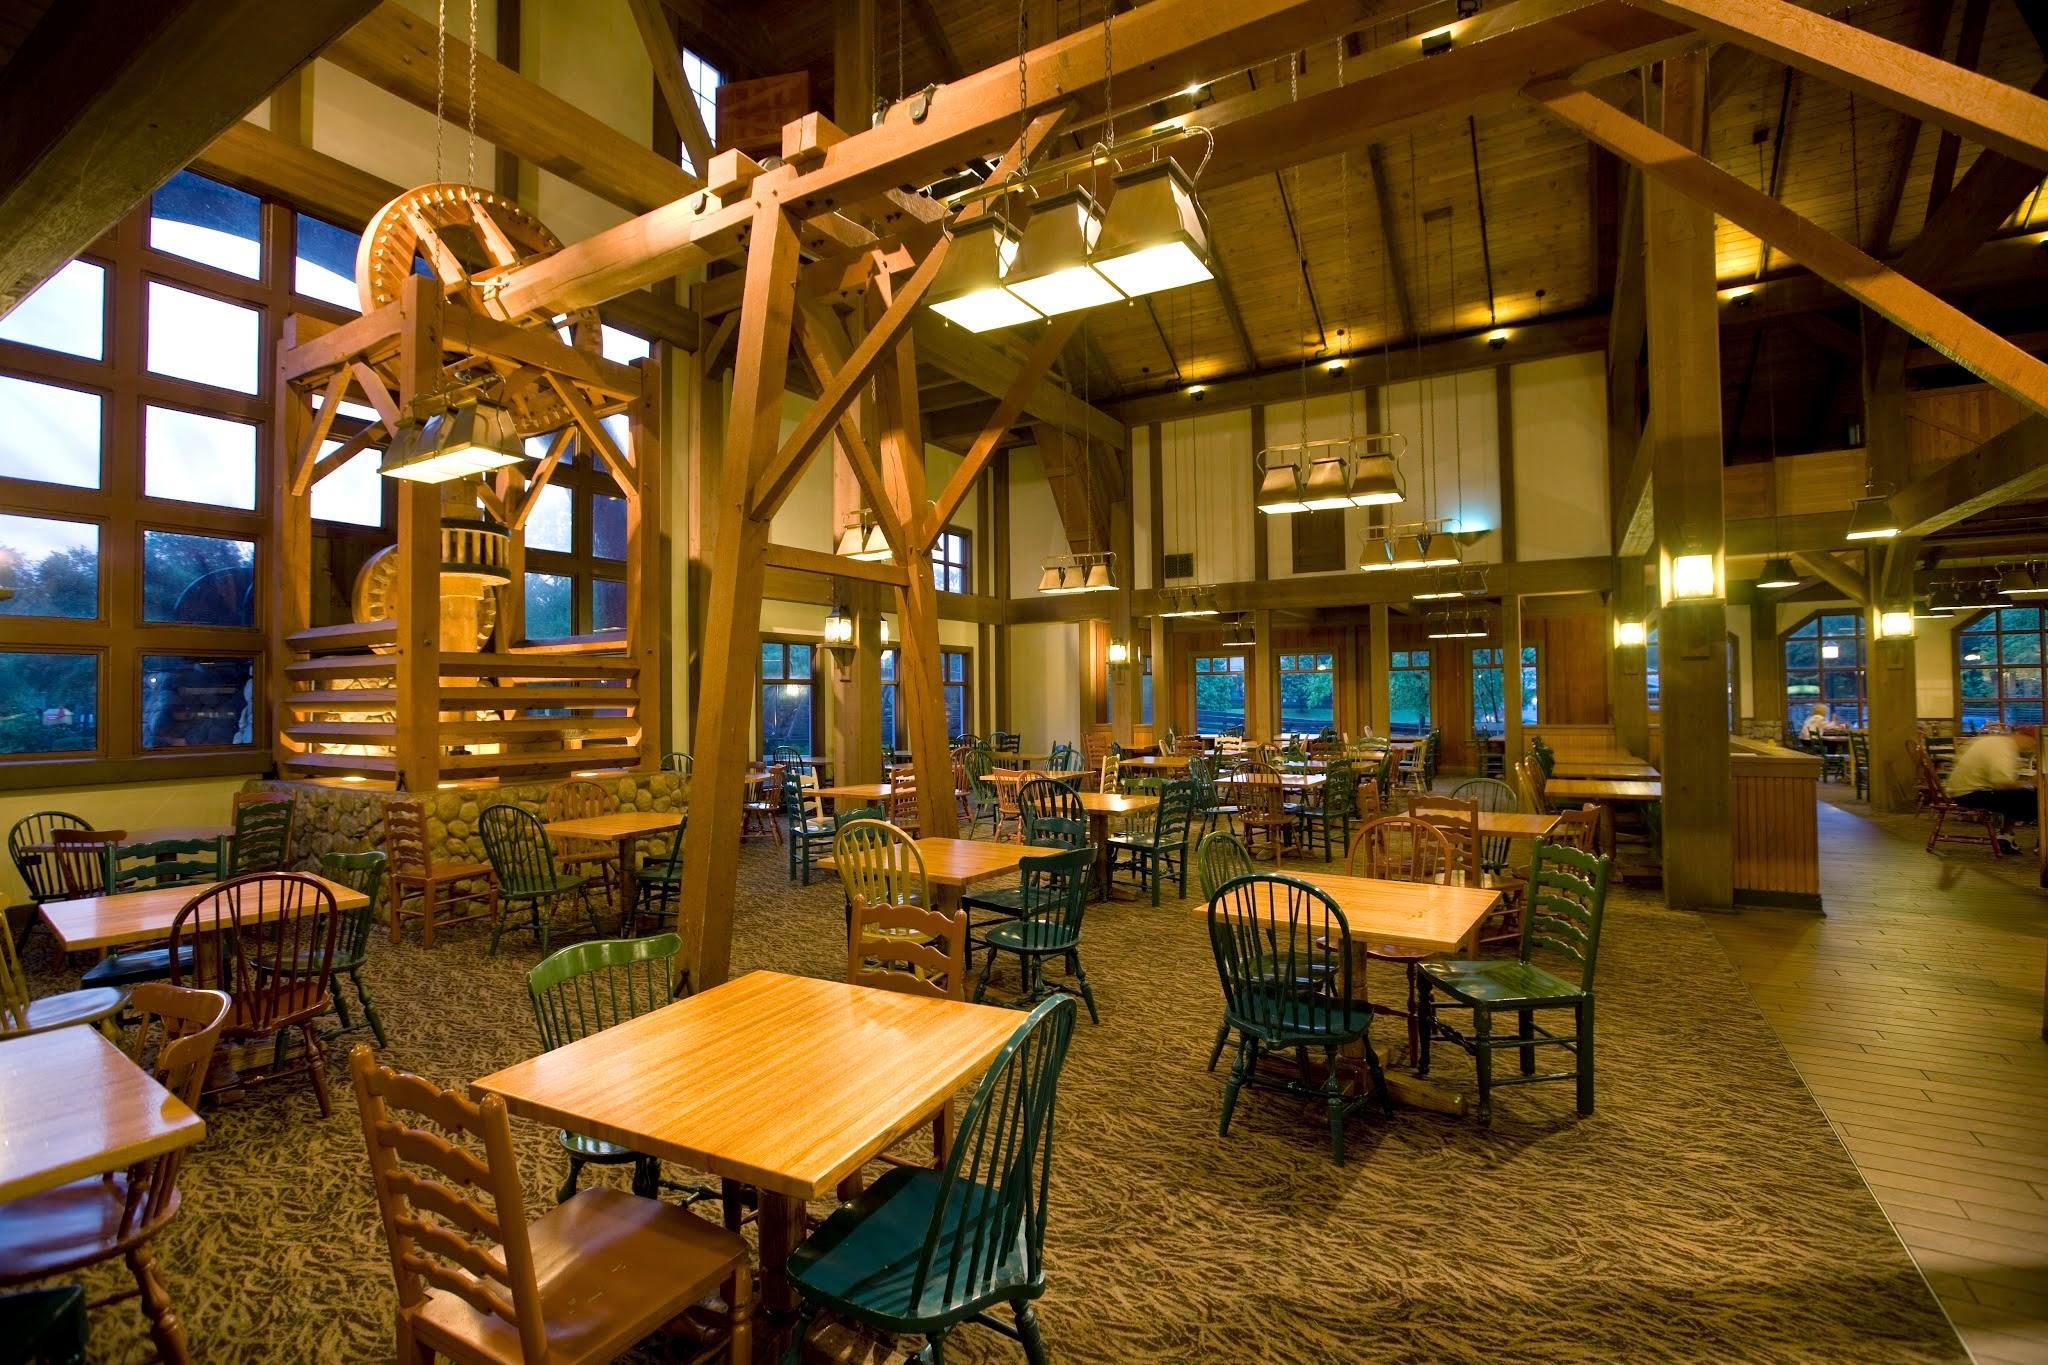 Riverside Mill Food Court image 6